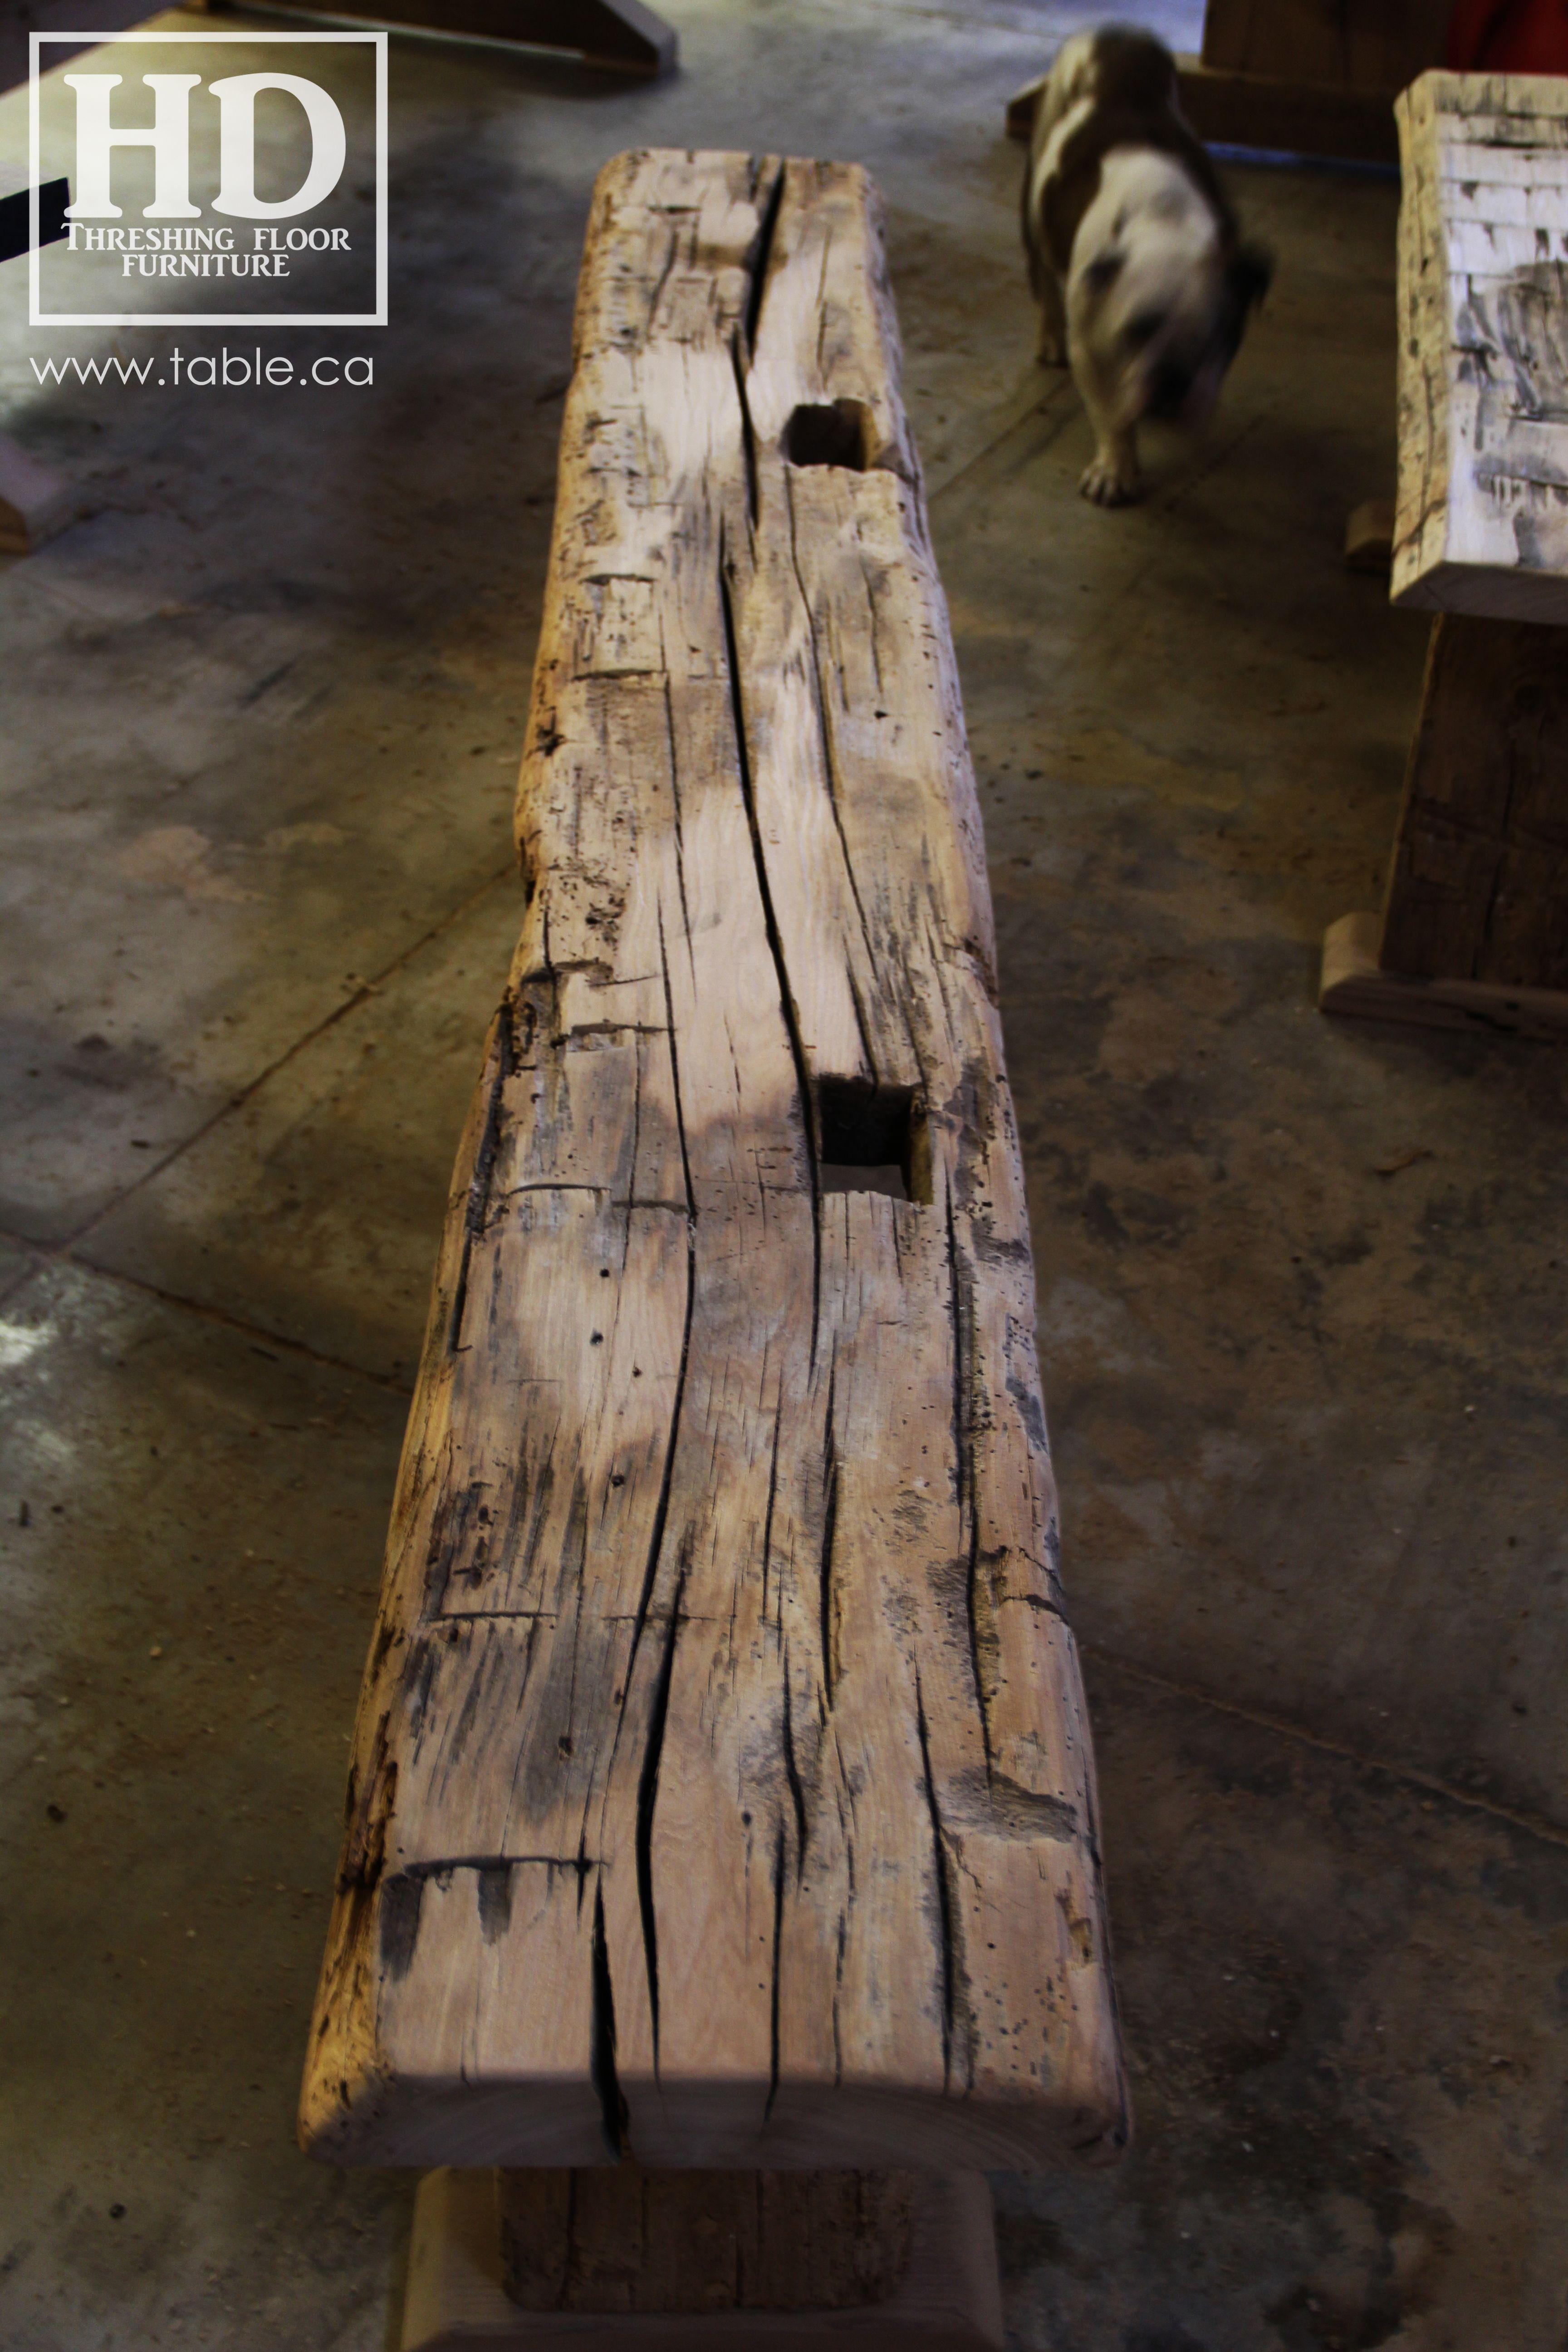 Ontario Reclaimed Wood Custom Furniture Hd Threshing Floor